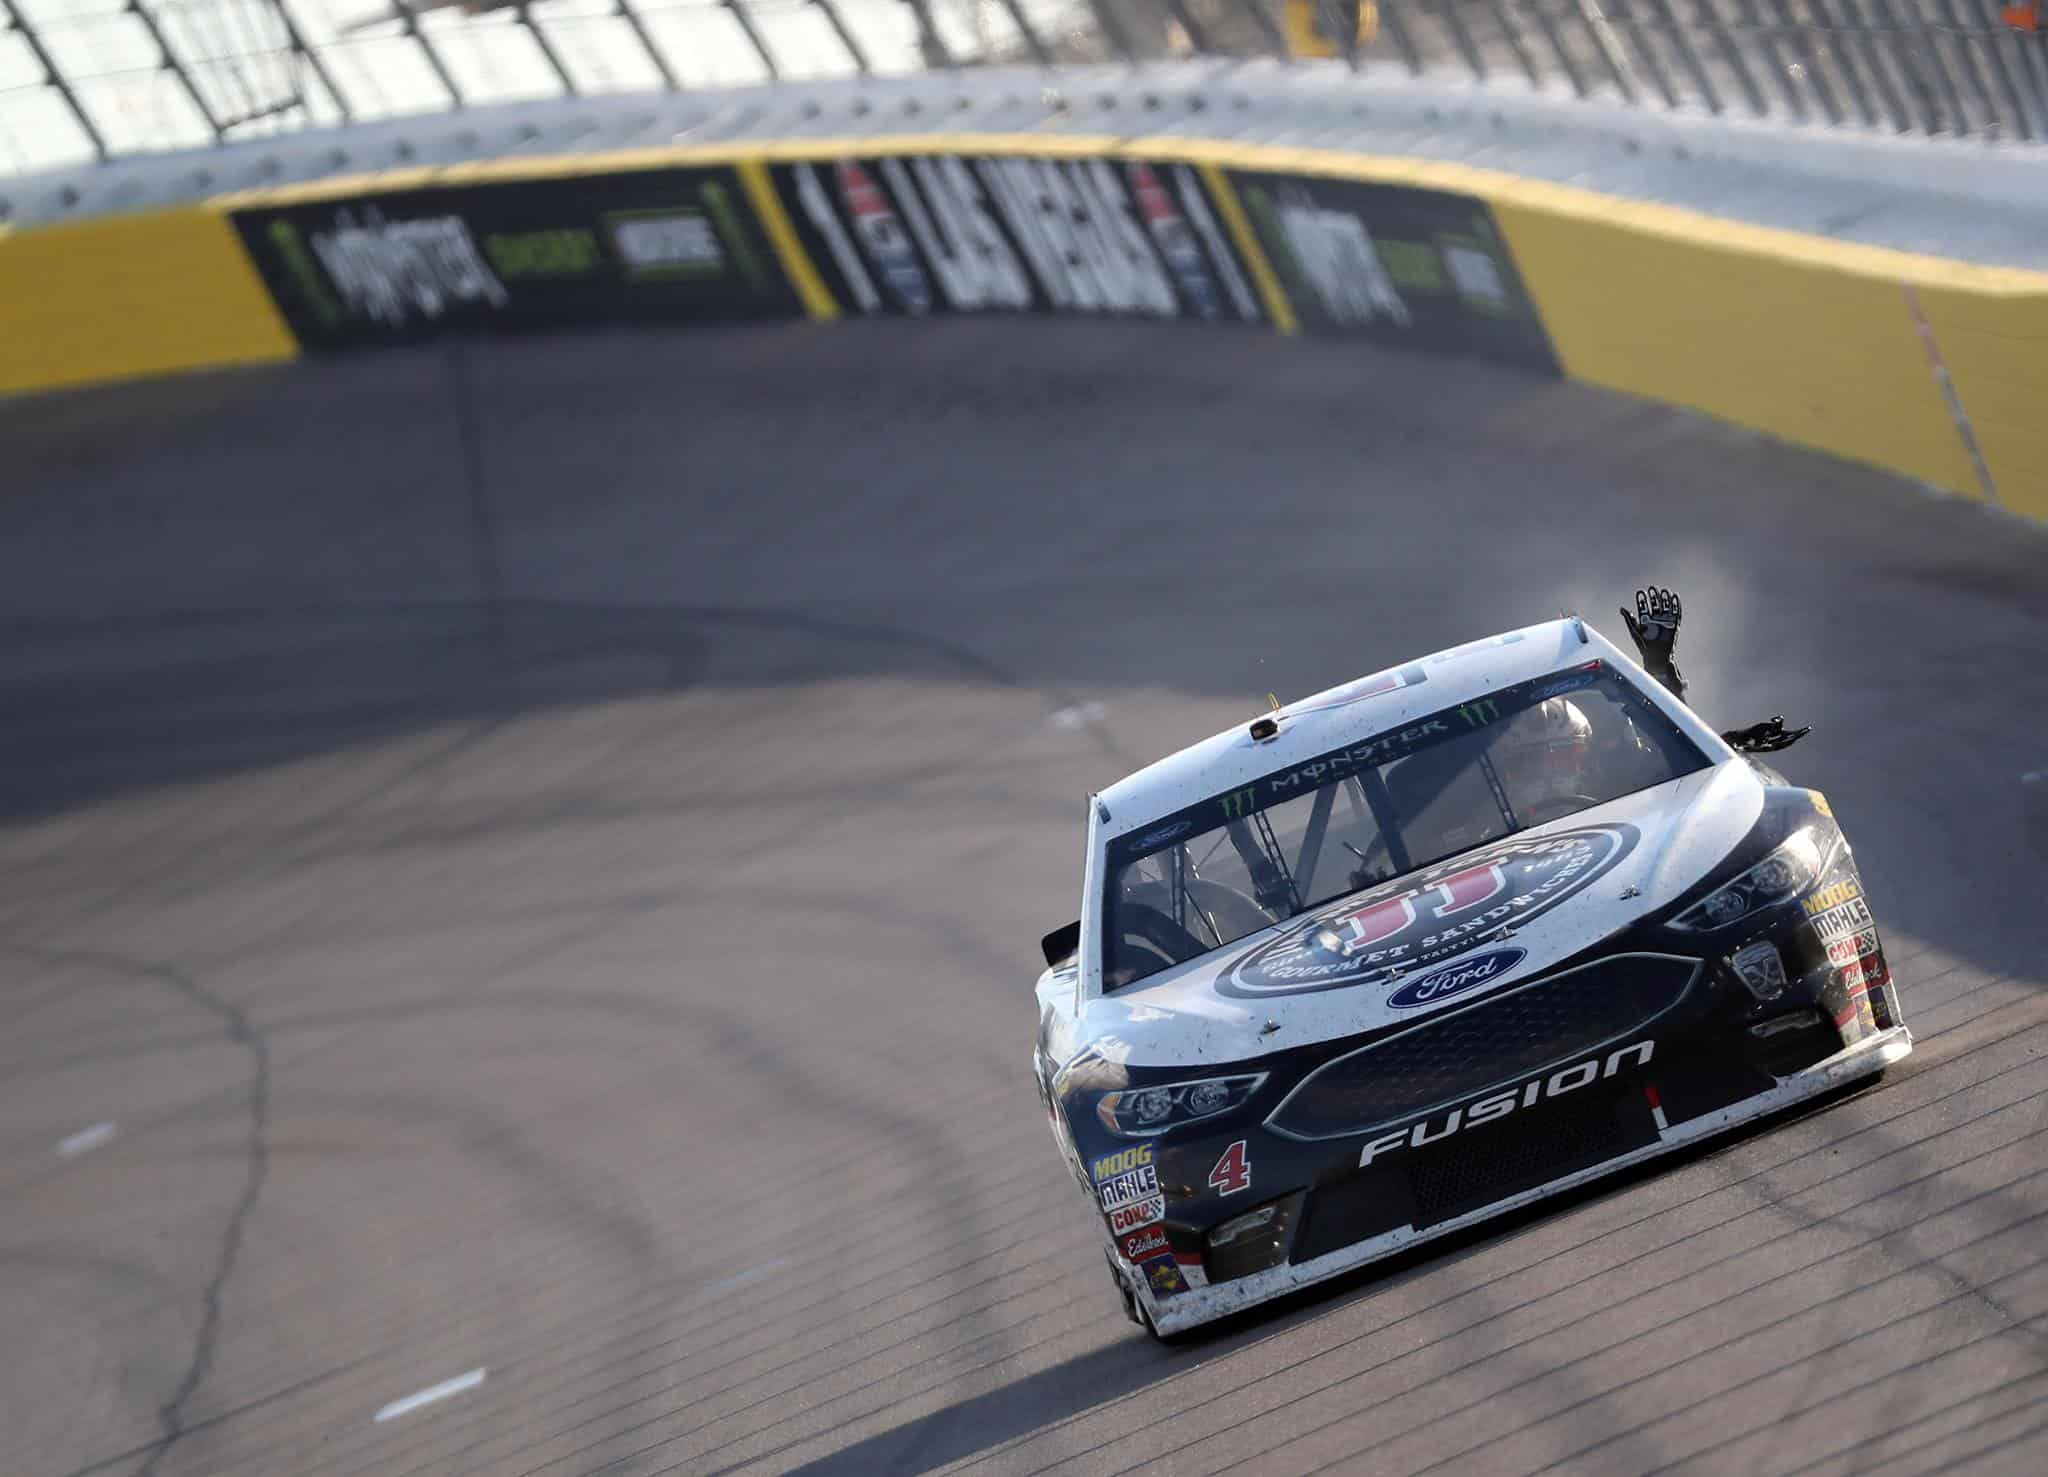 Kevin Harvick wins at Las Vegas Motor Speedway - NASCAR